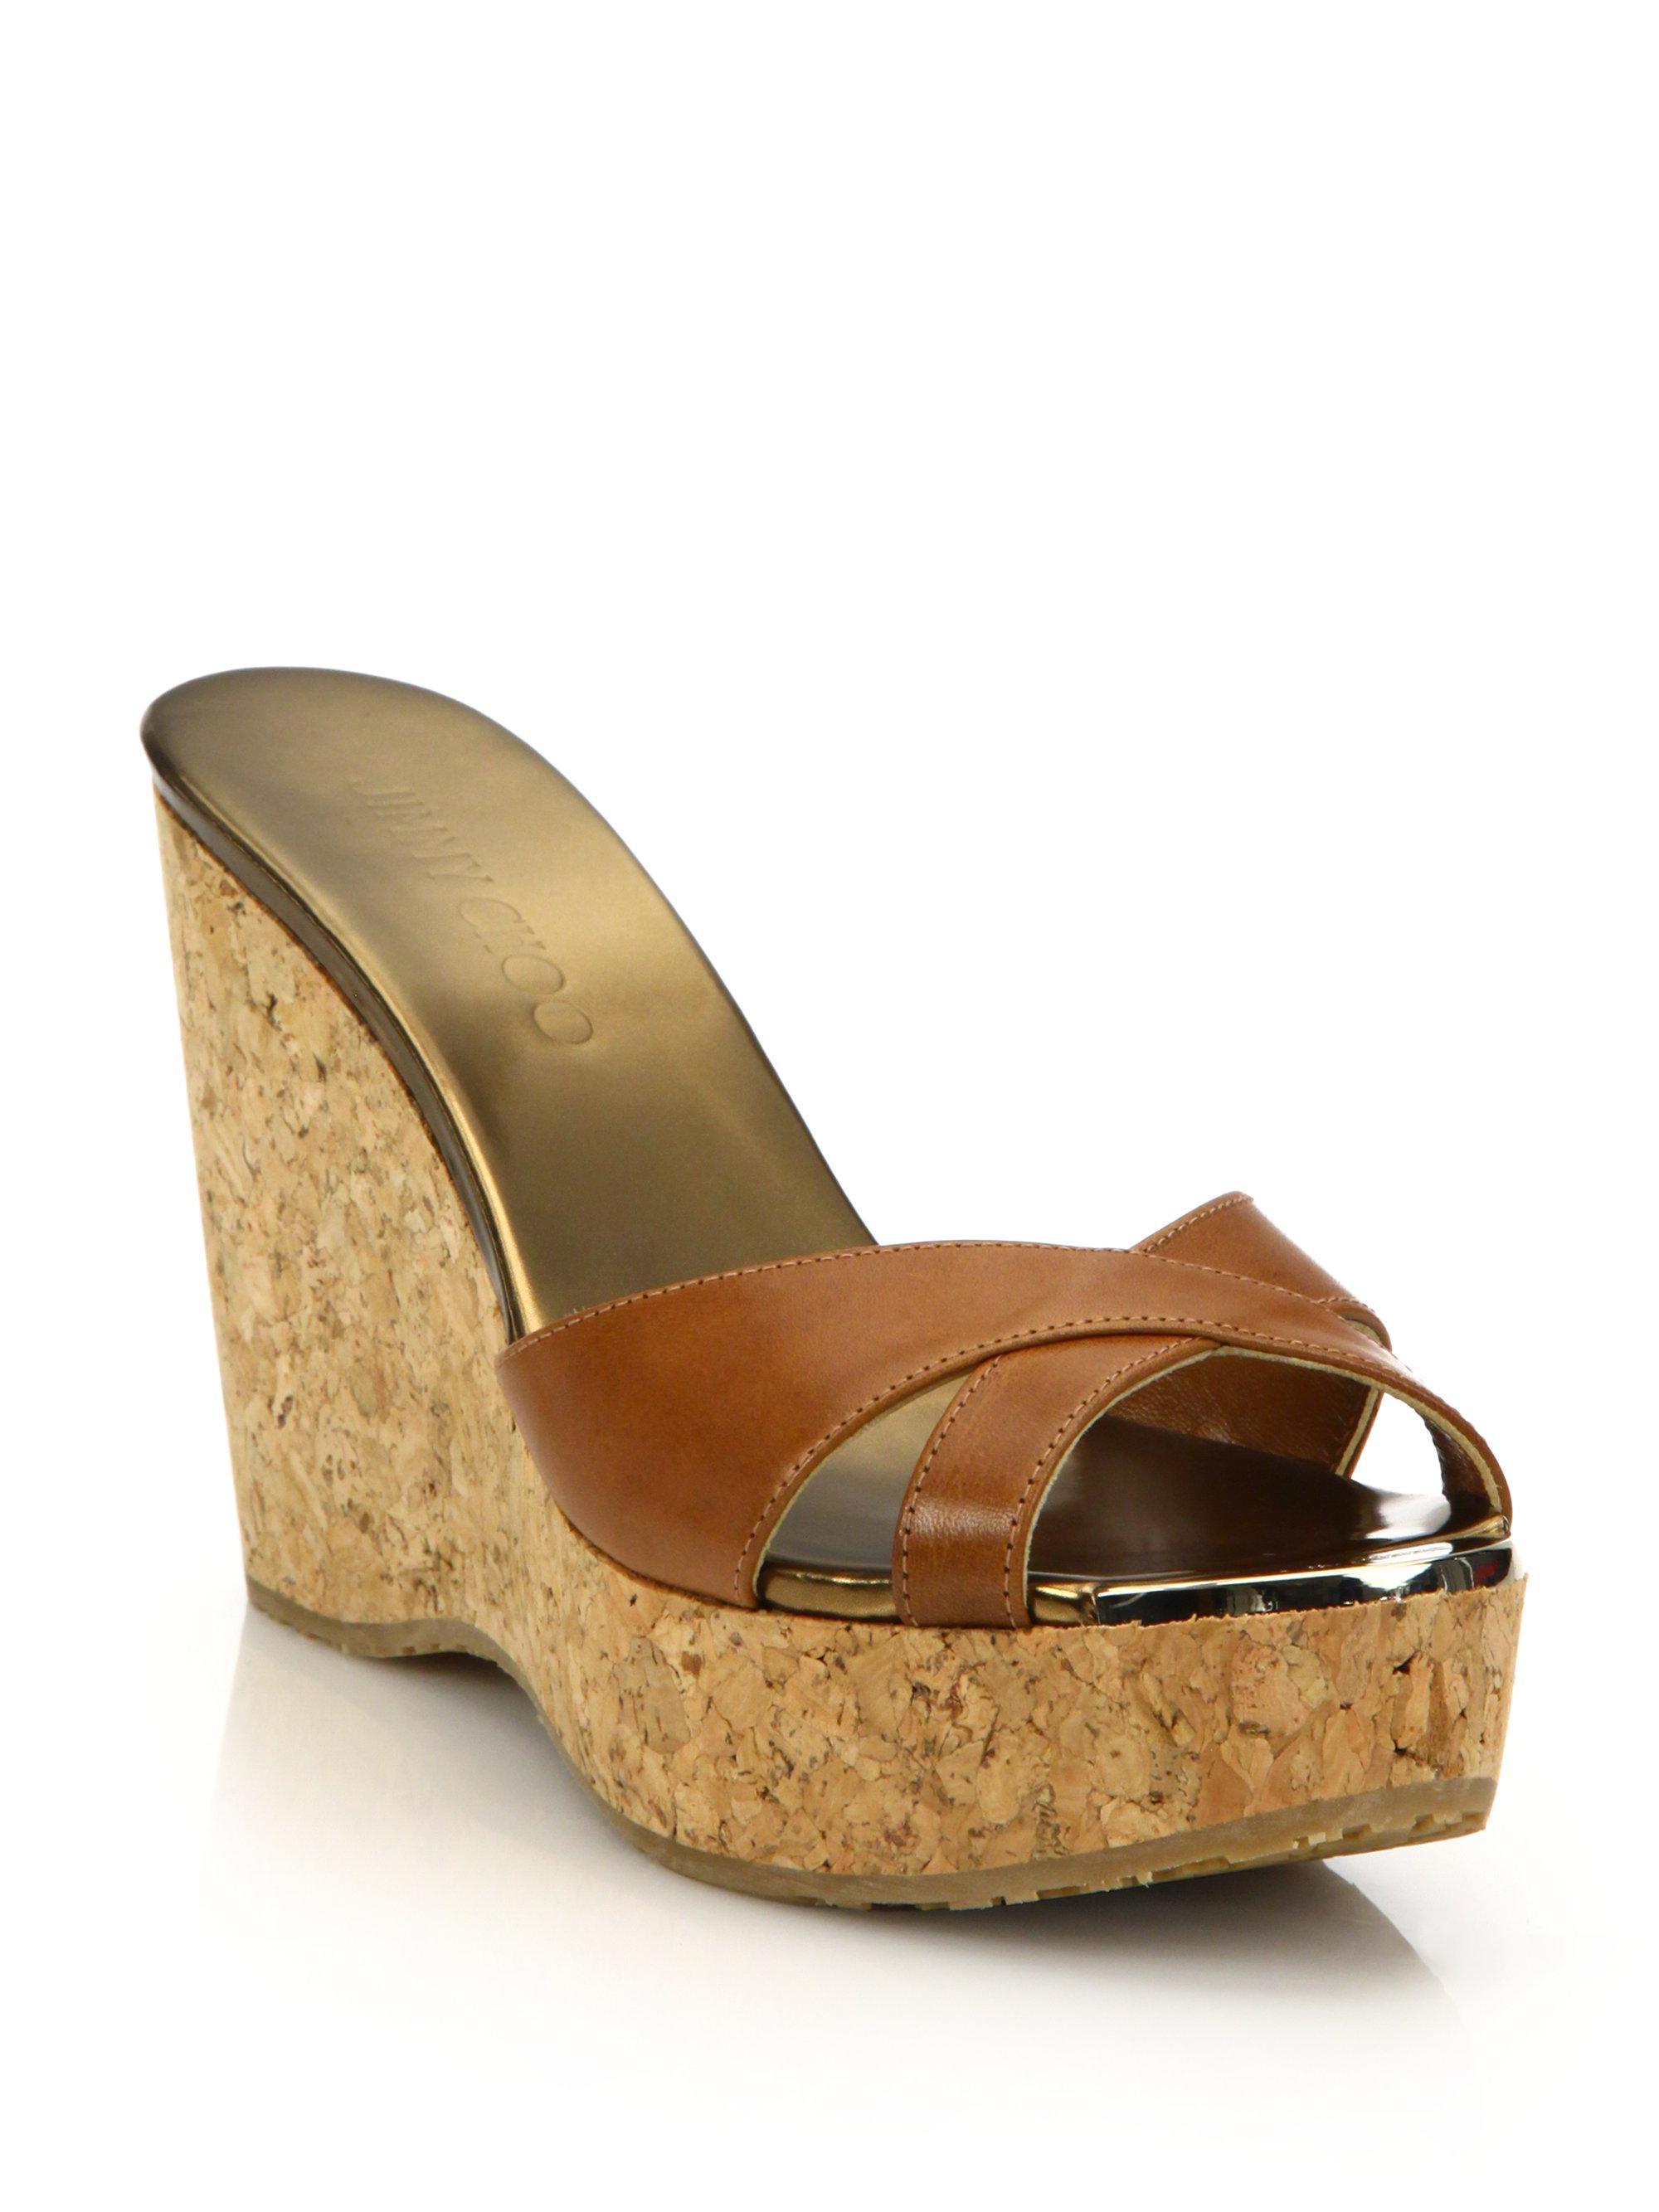 dc5890e08541 Lyst - Jimmy Choo Perfume 100 Leather   Cork Platform Wedge Sandals ...